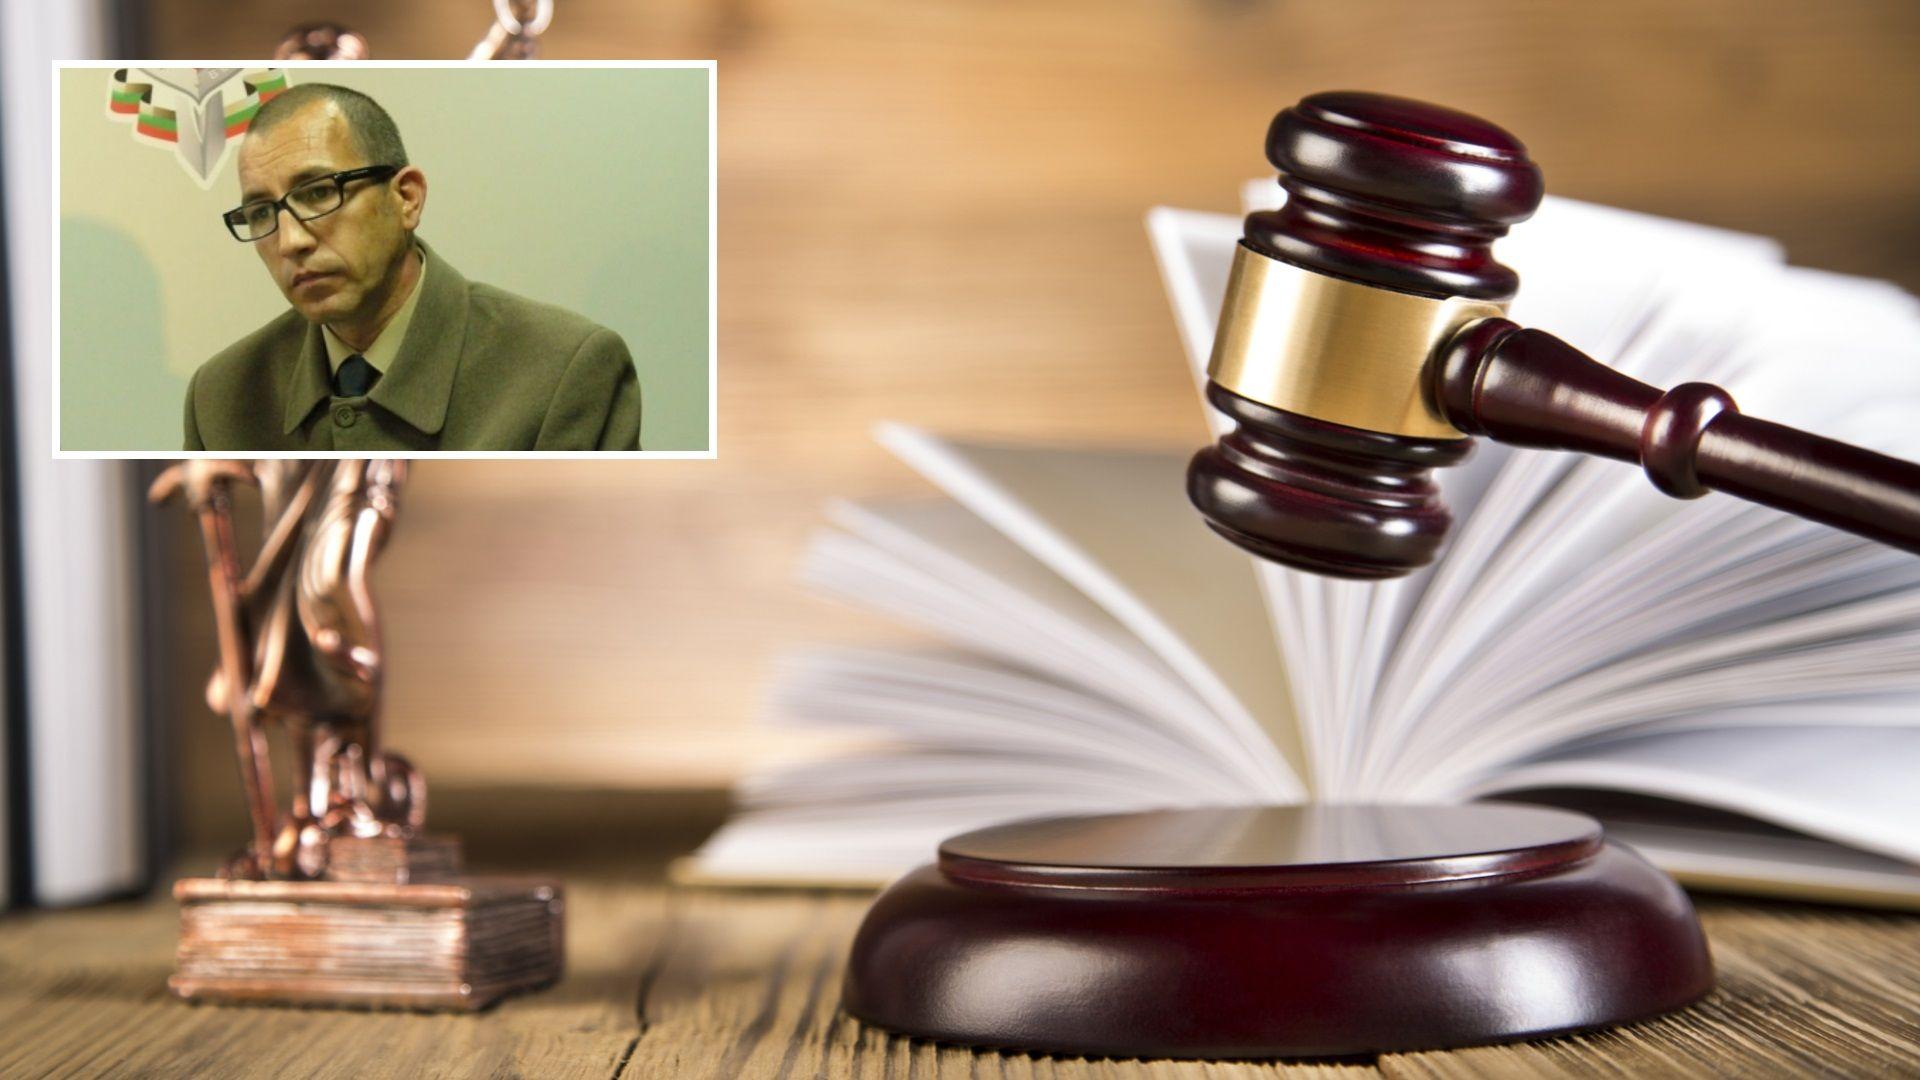 Прокурор е оправдан за натиск над колеги заради невменяемост